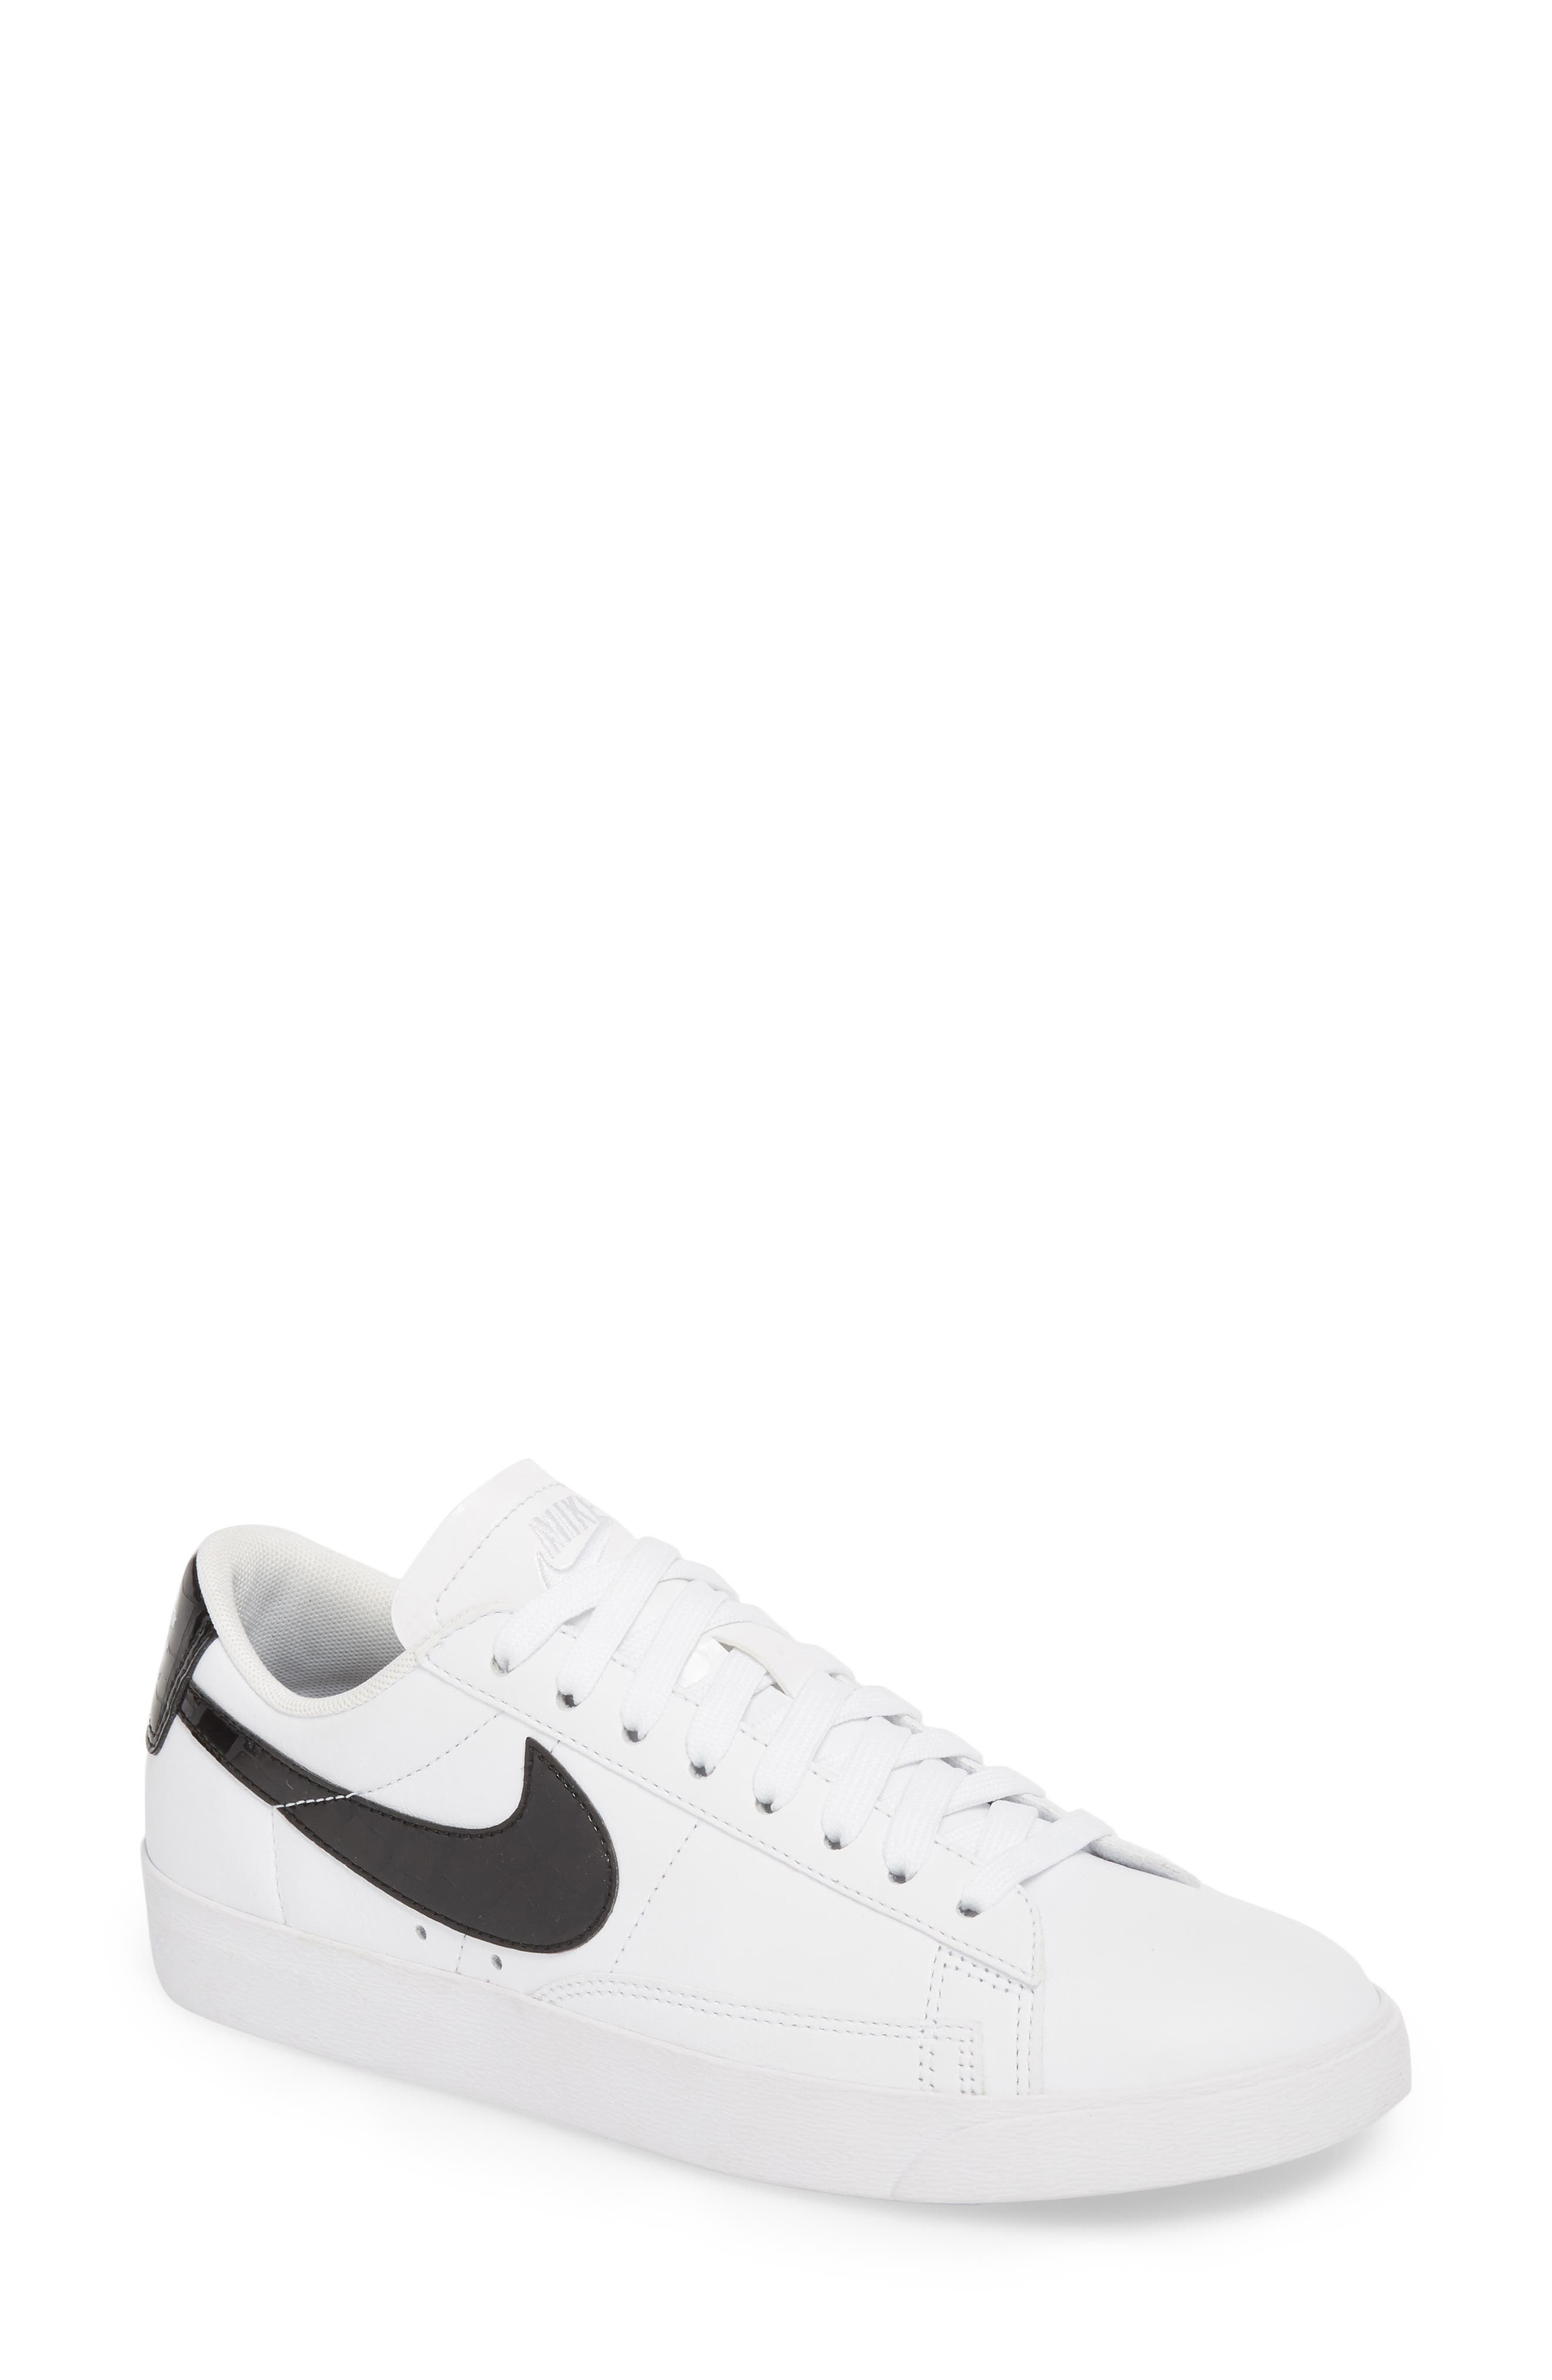 Blazer Low Essential Sneaker,                         Main,                         color, 100